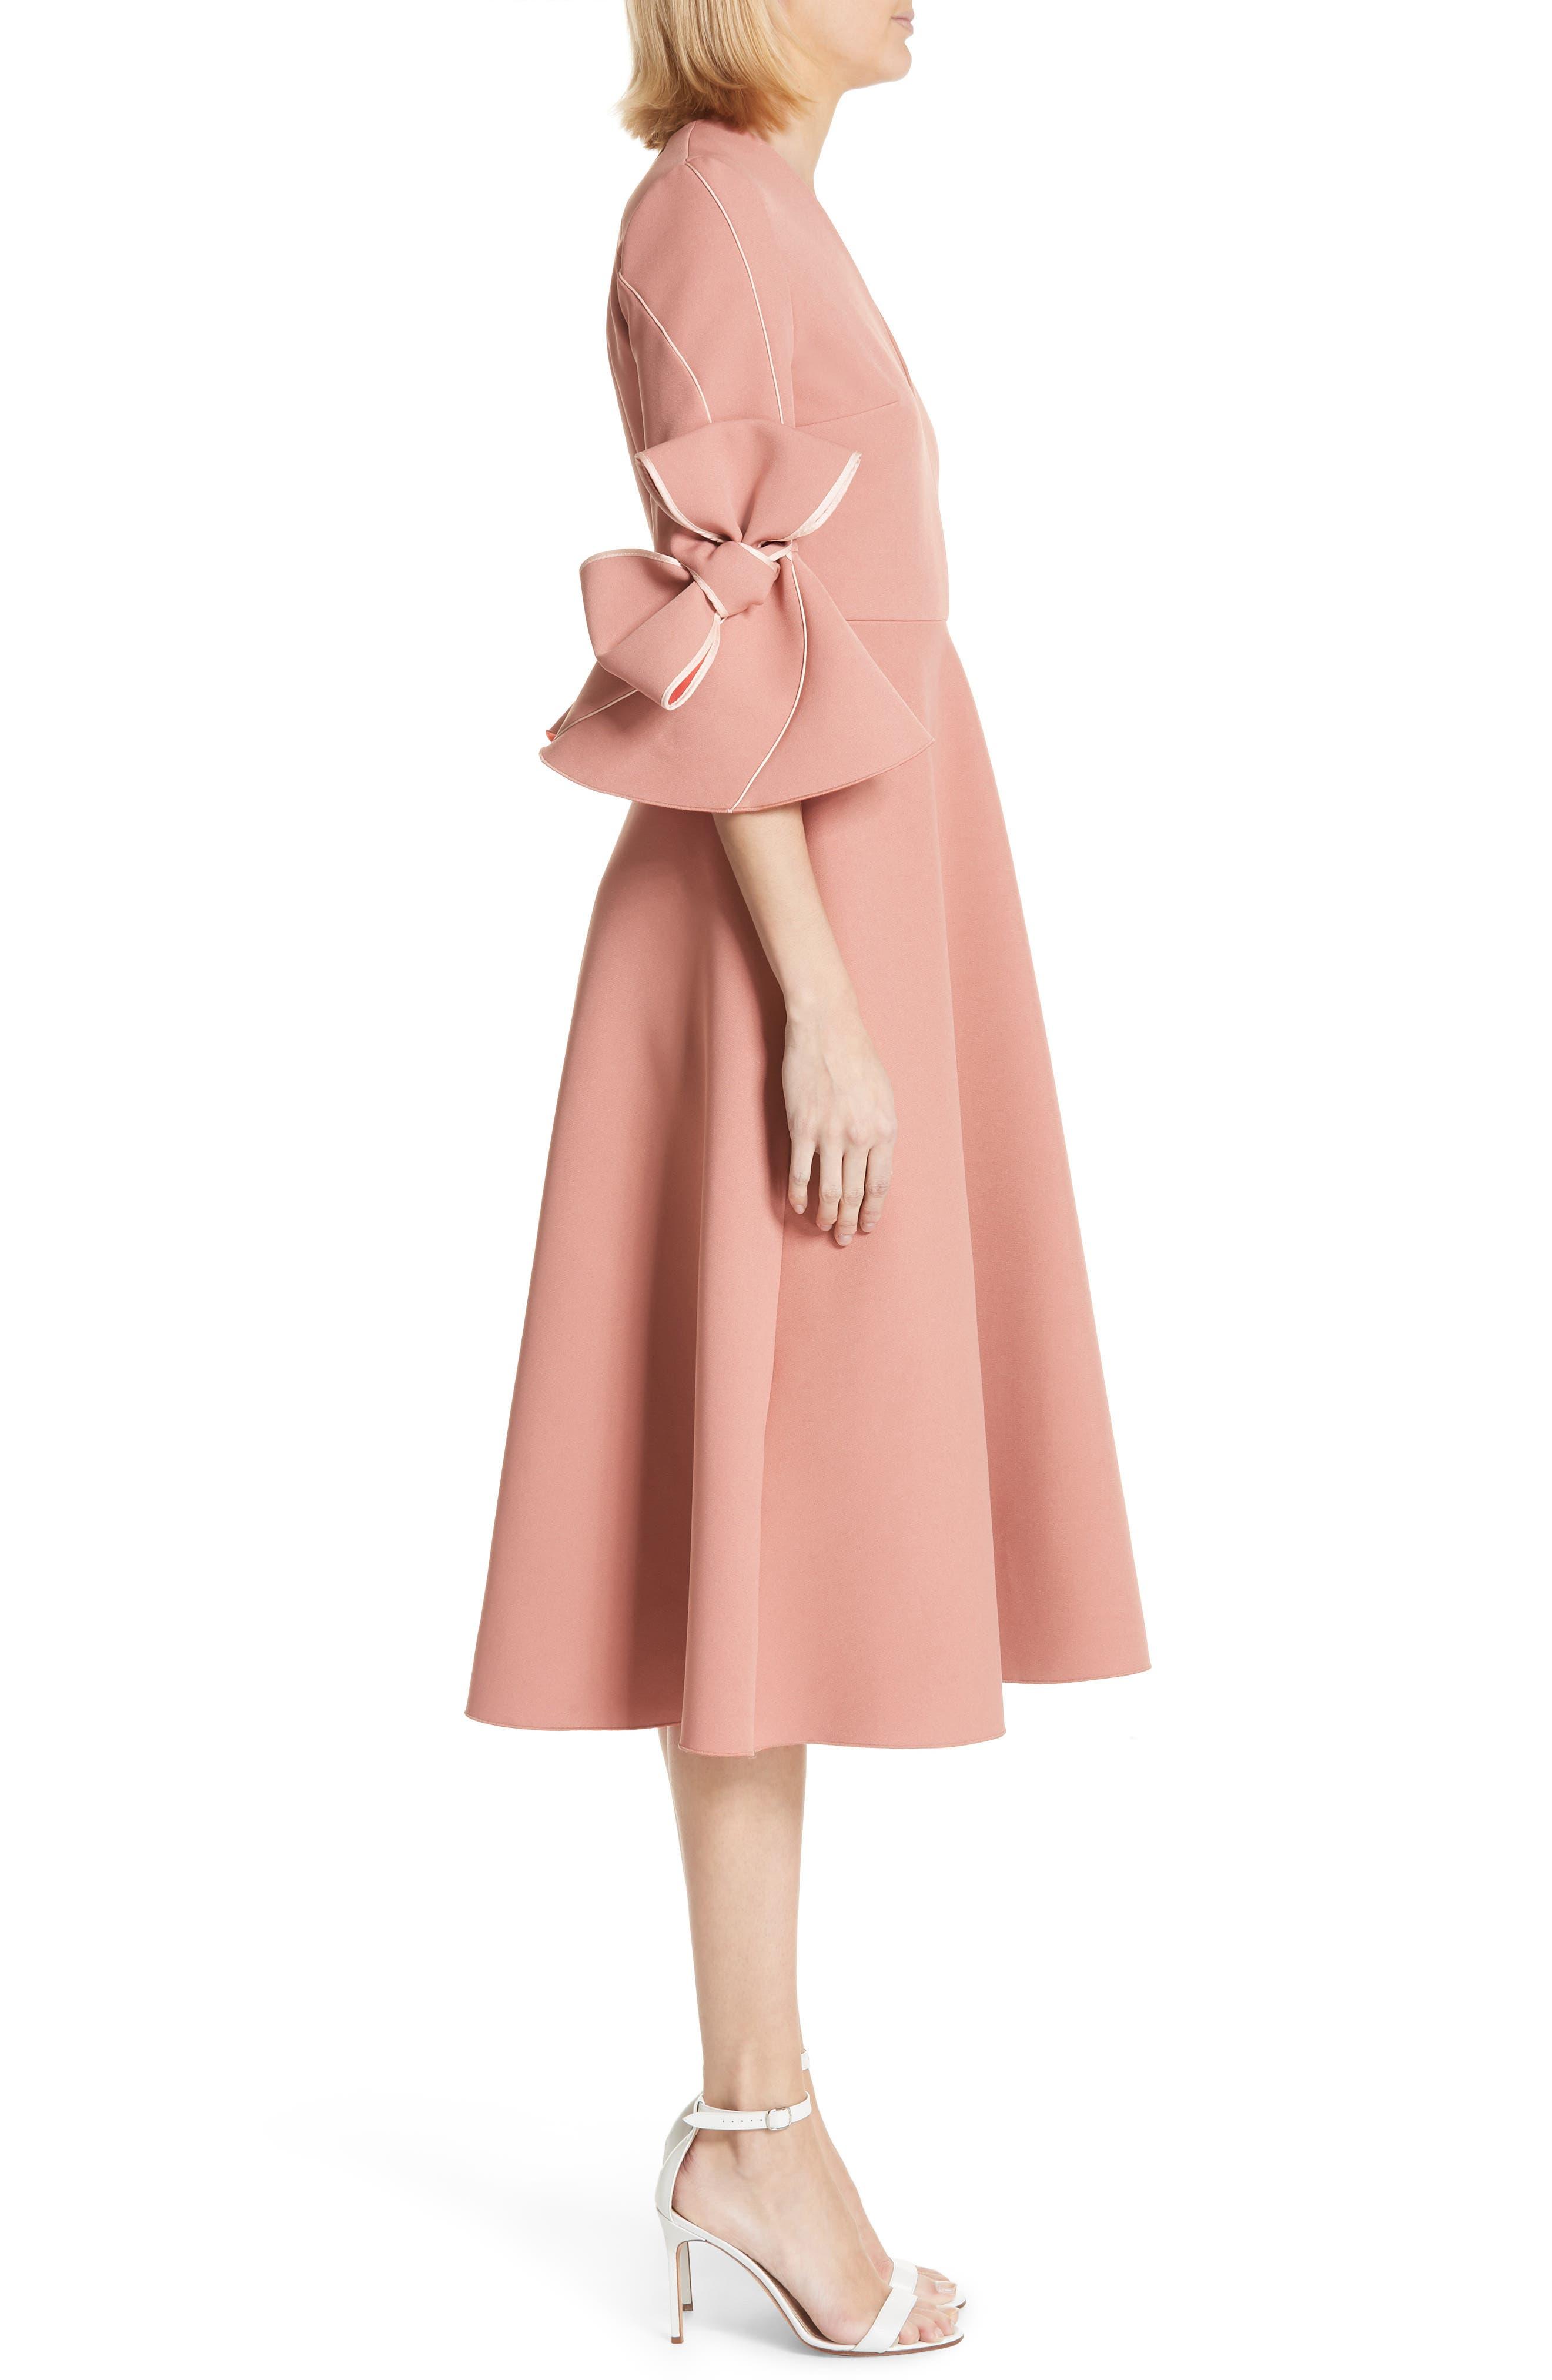 Sibella Bow Trim Dress,                             Alternate thumbnail 3, color,                             950